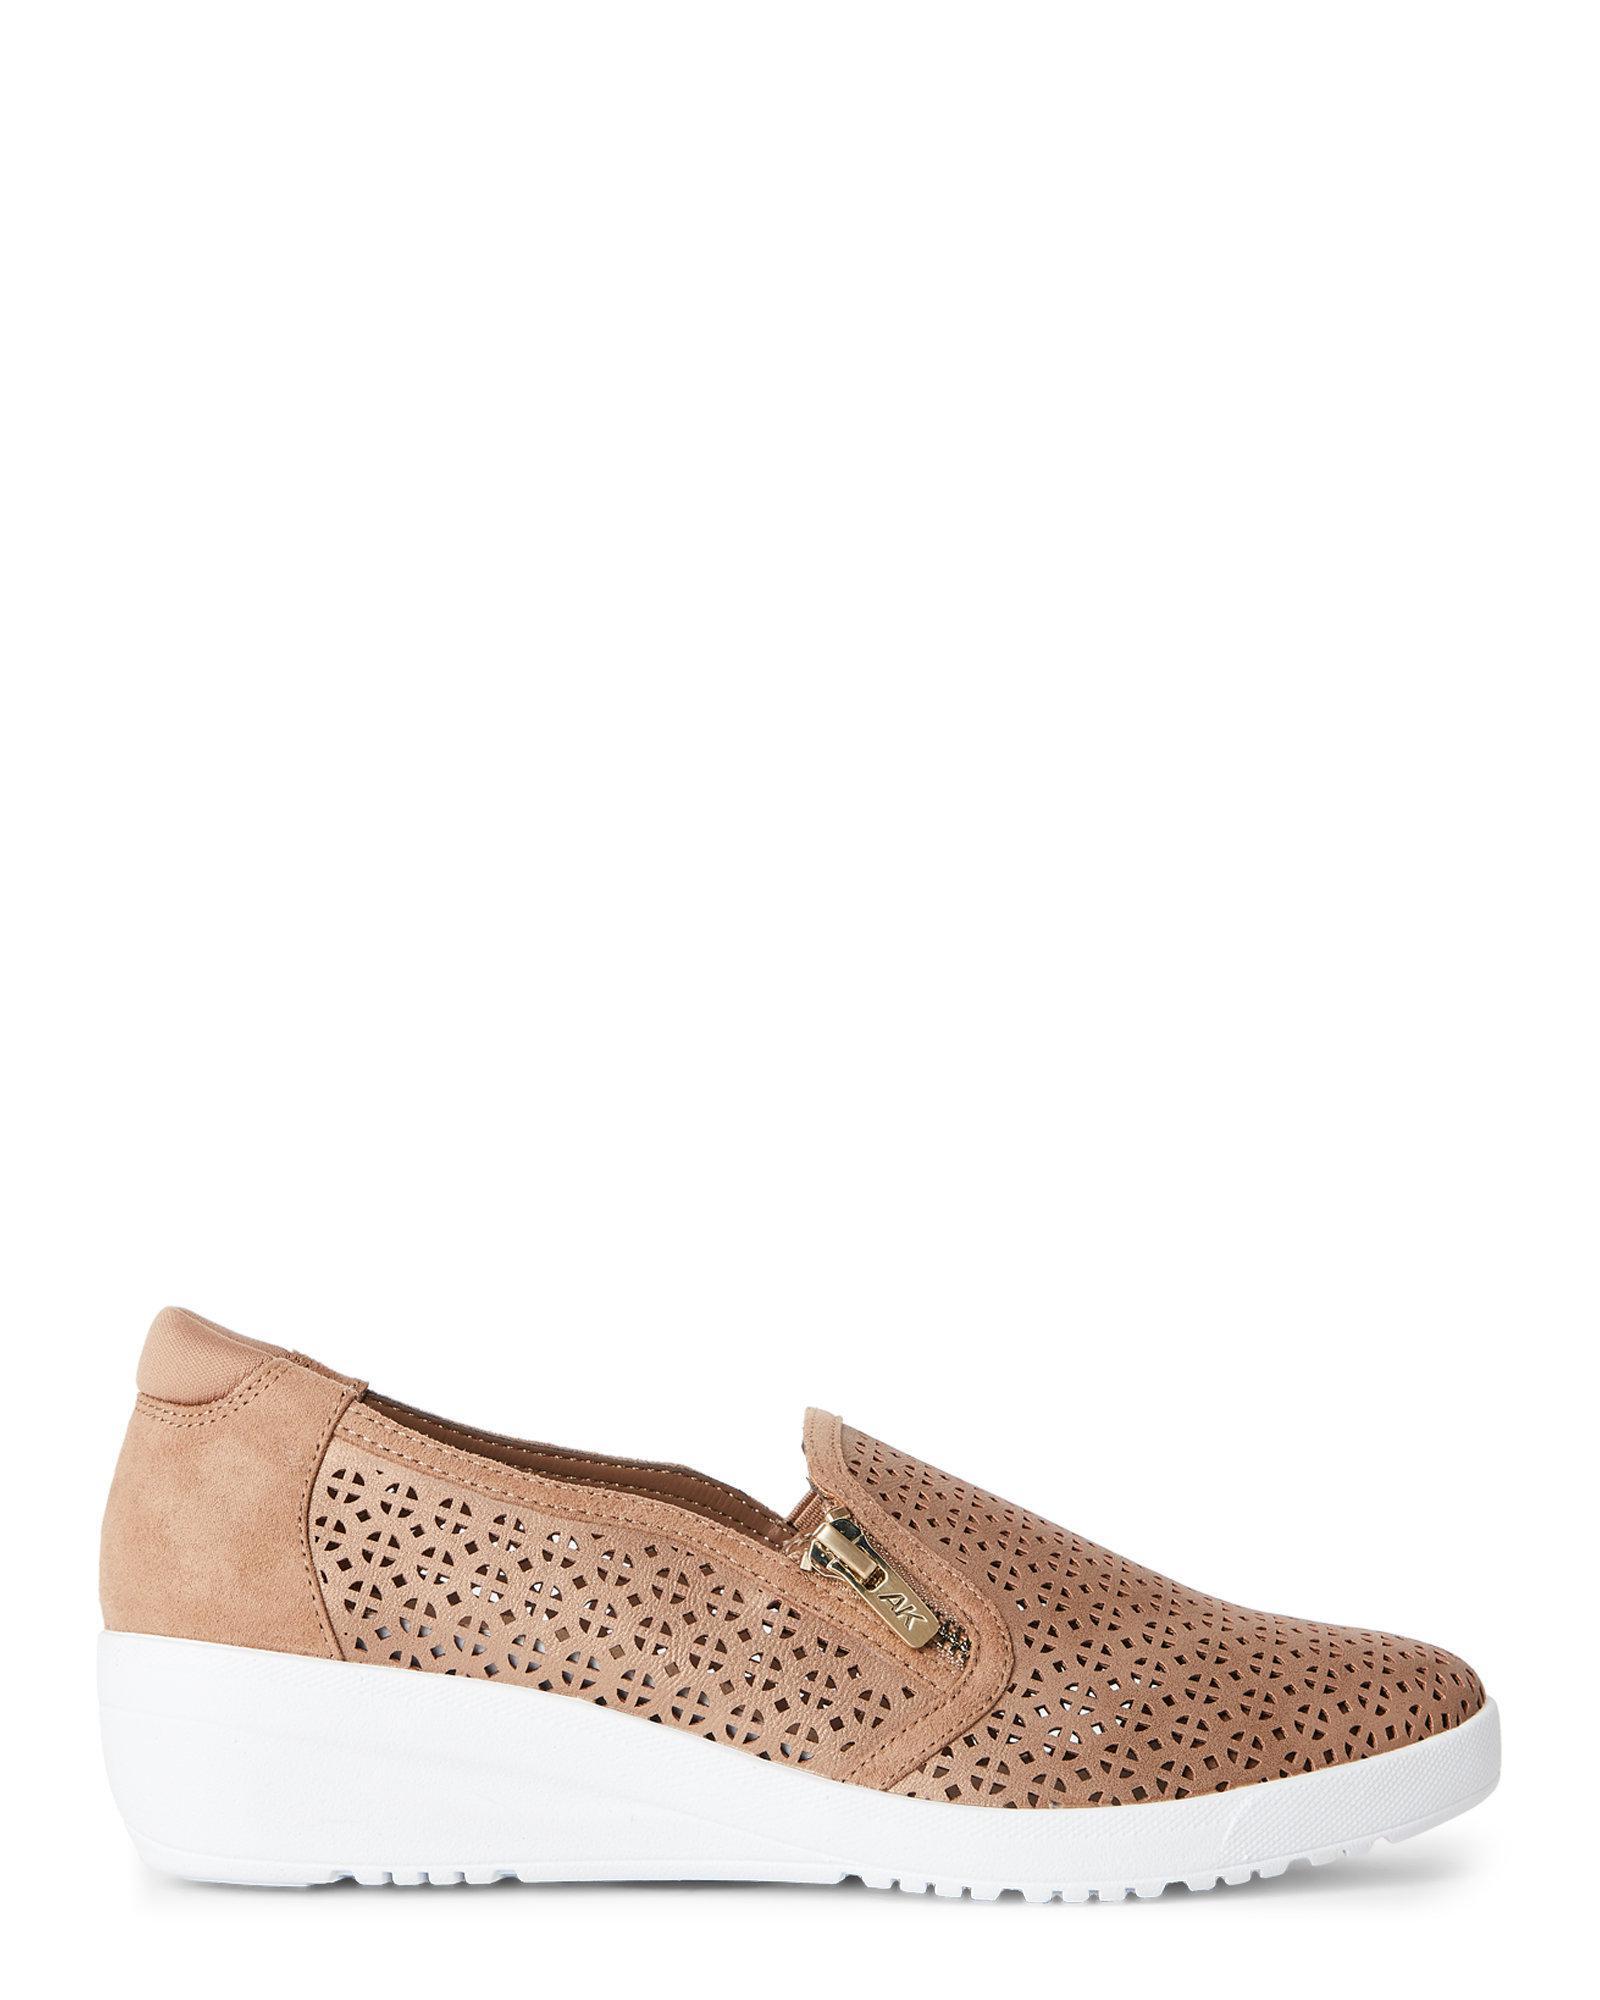 Ak Anne Klein Bronze Yepa Perforated Wedge Sneakers